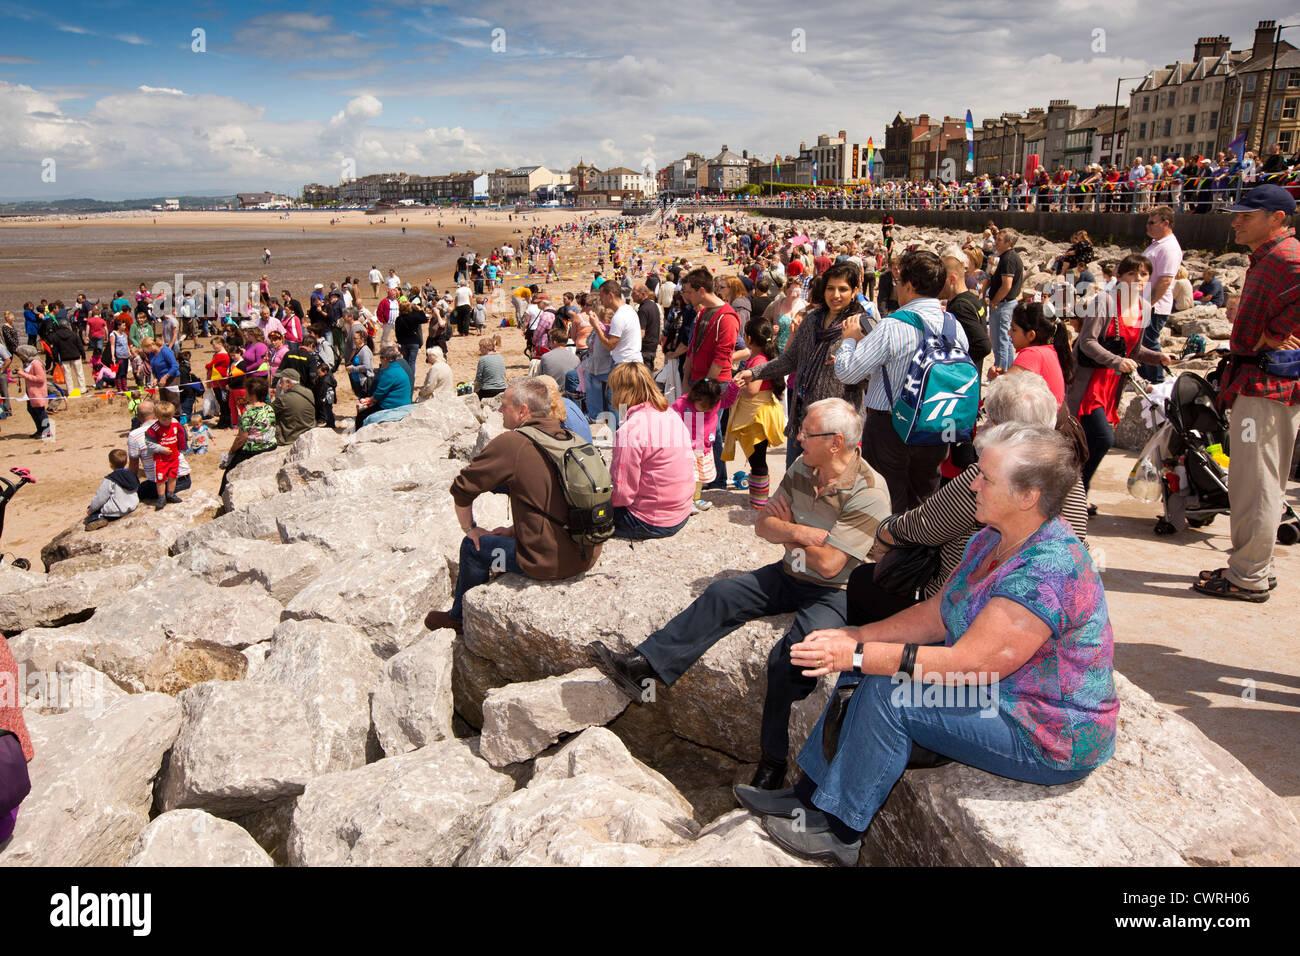 UK, England, Lancashire, Morecambe beach, crowds of visitors watching entertainment - Stock Image